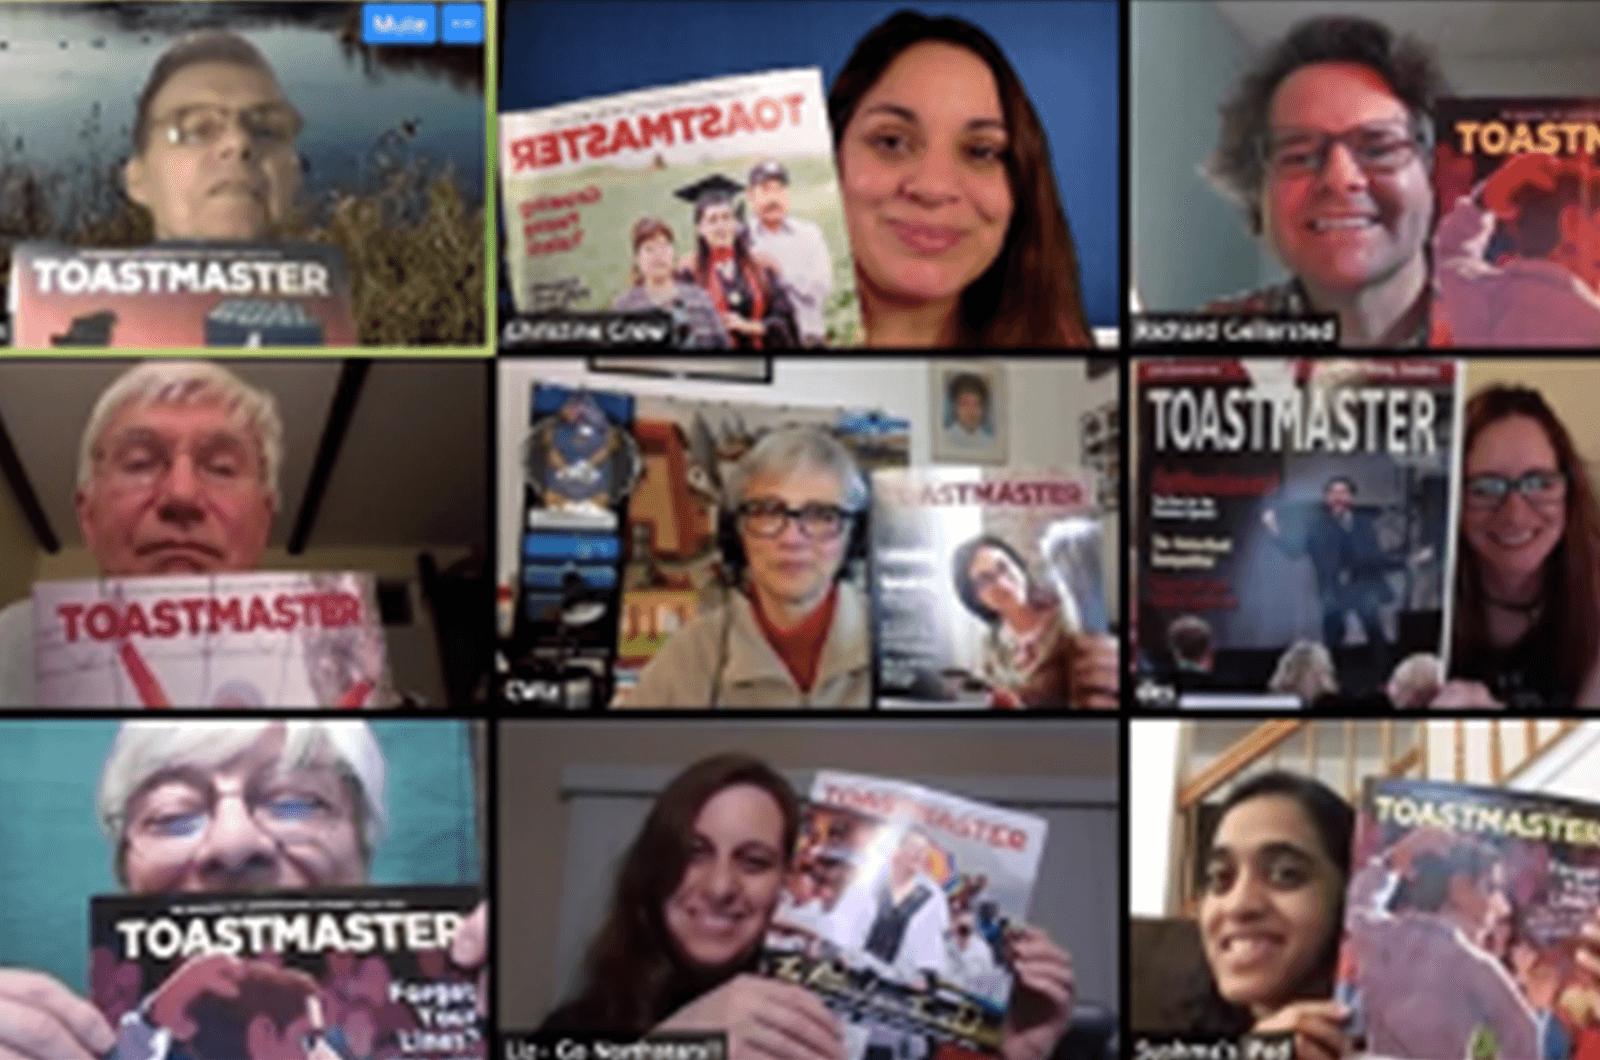 People on Zoom meeting holding up Toastmaster magazines